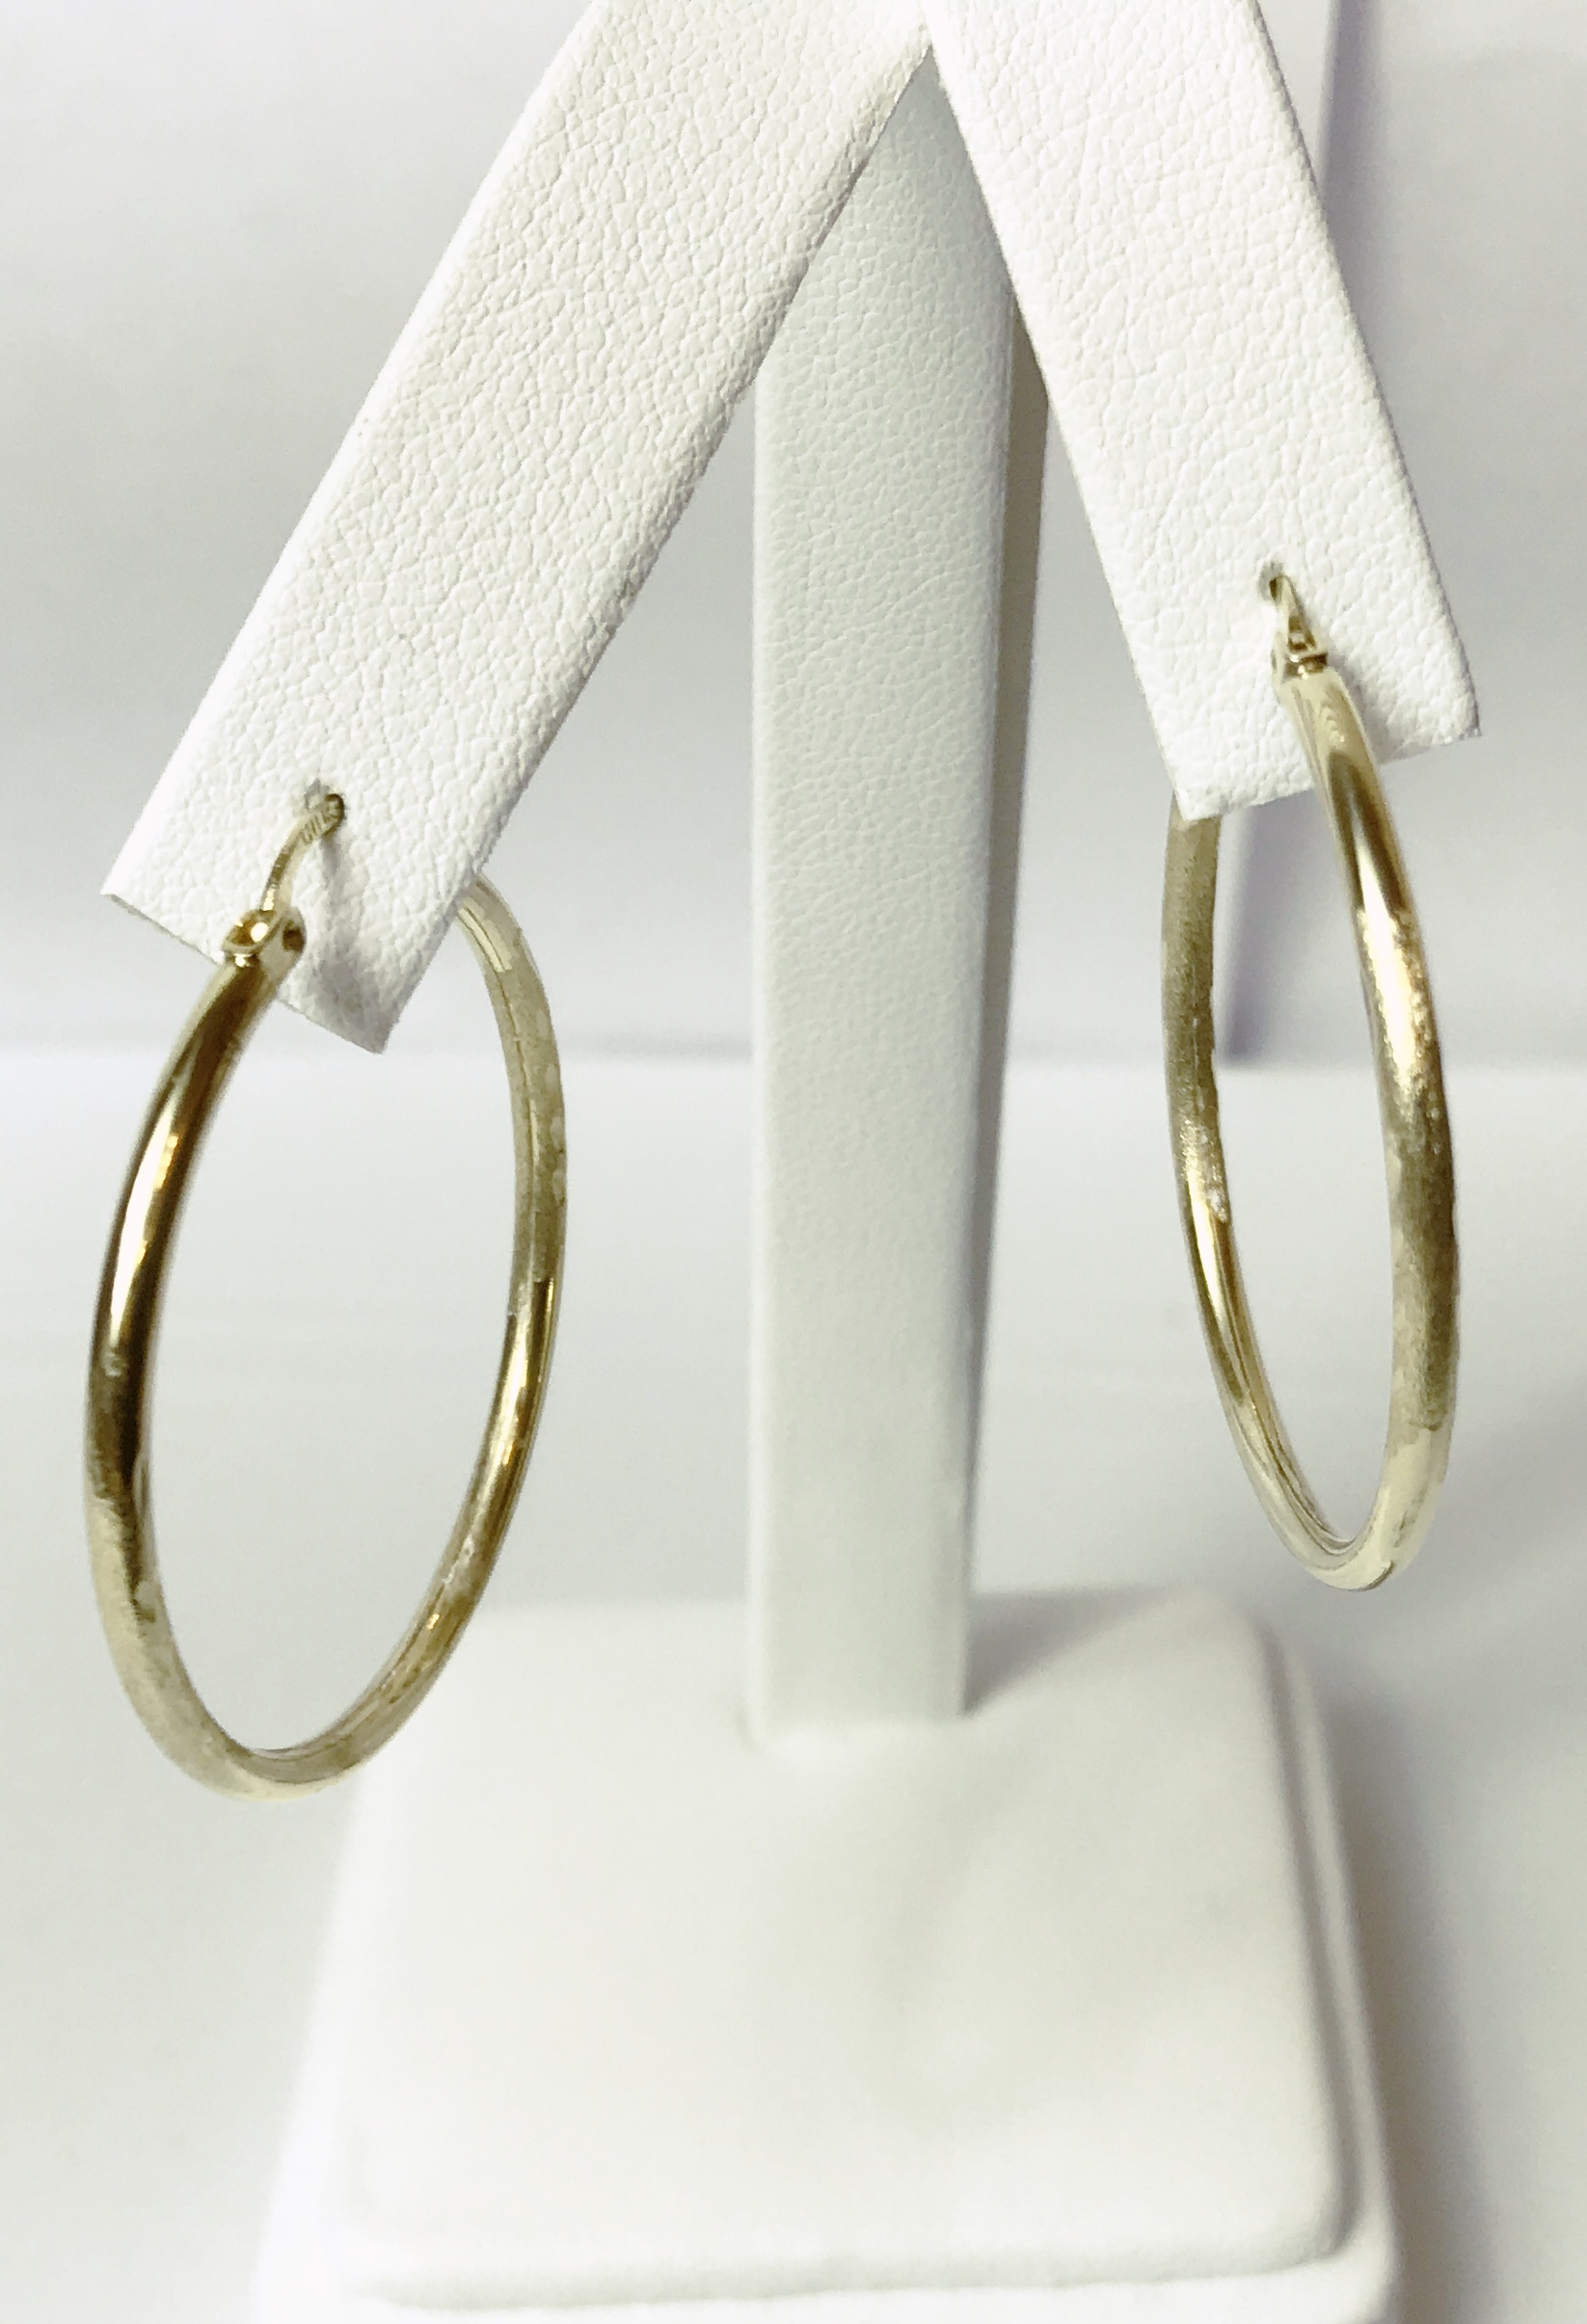 14K Yellow Gold 3.4g Hoop Earrings